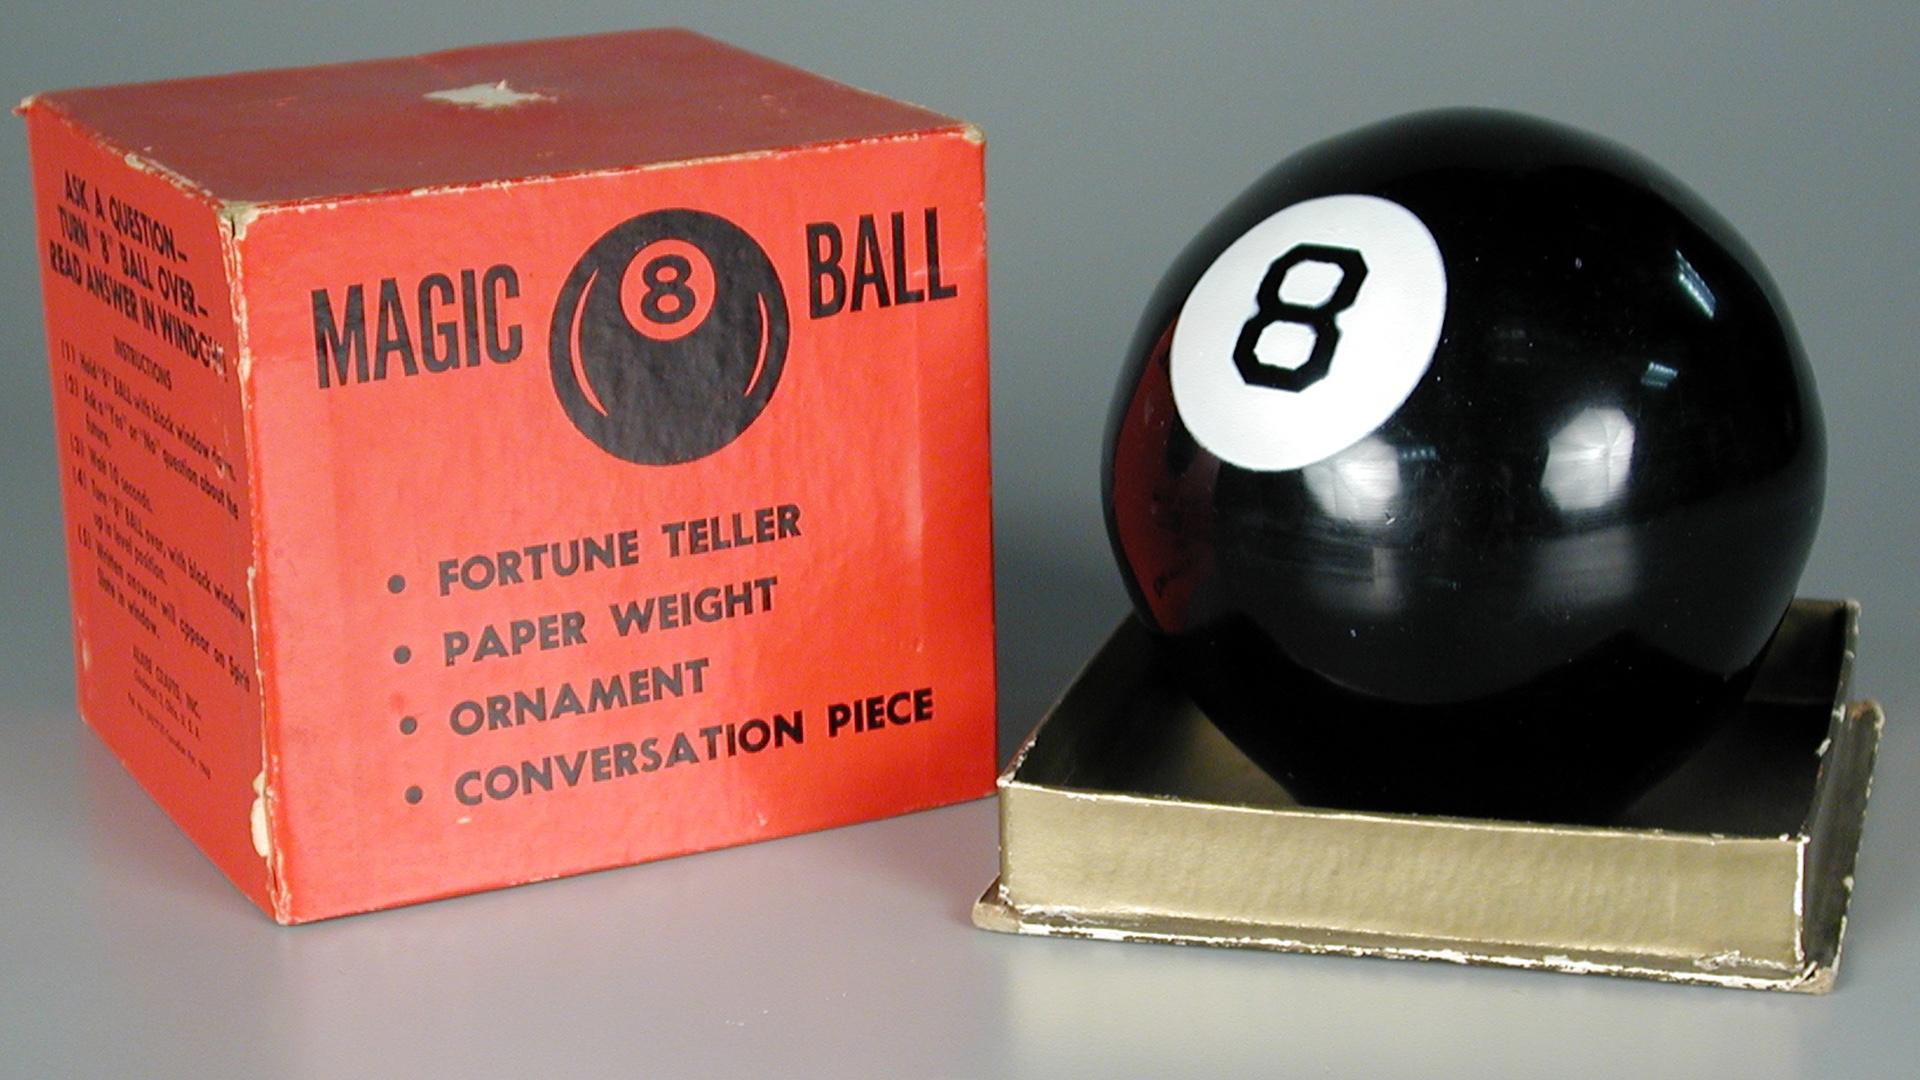 Magic 8 Ball Play Toy High Quality Mattel New